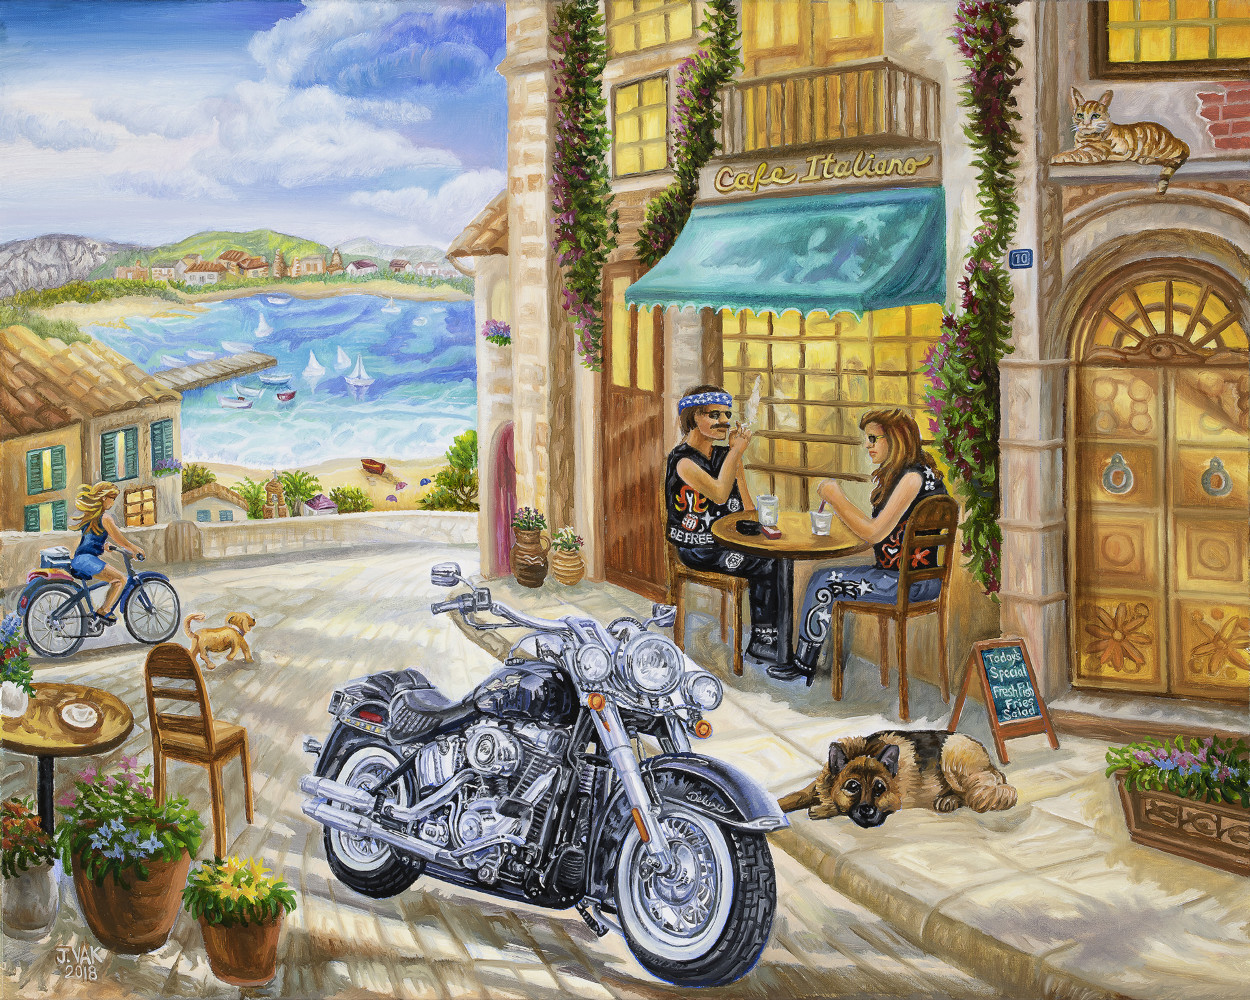 Harley Davidson Vacation 24 X 30 Original Oil            $2500             2019